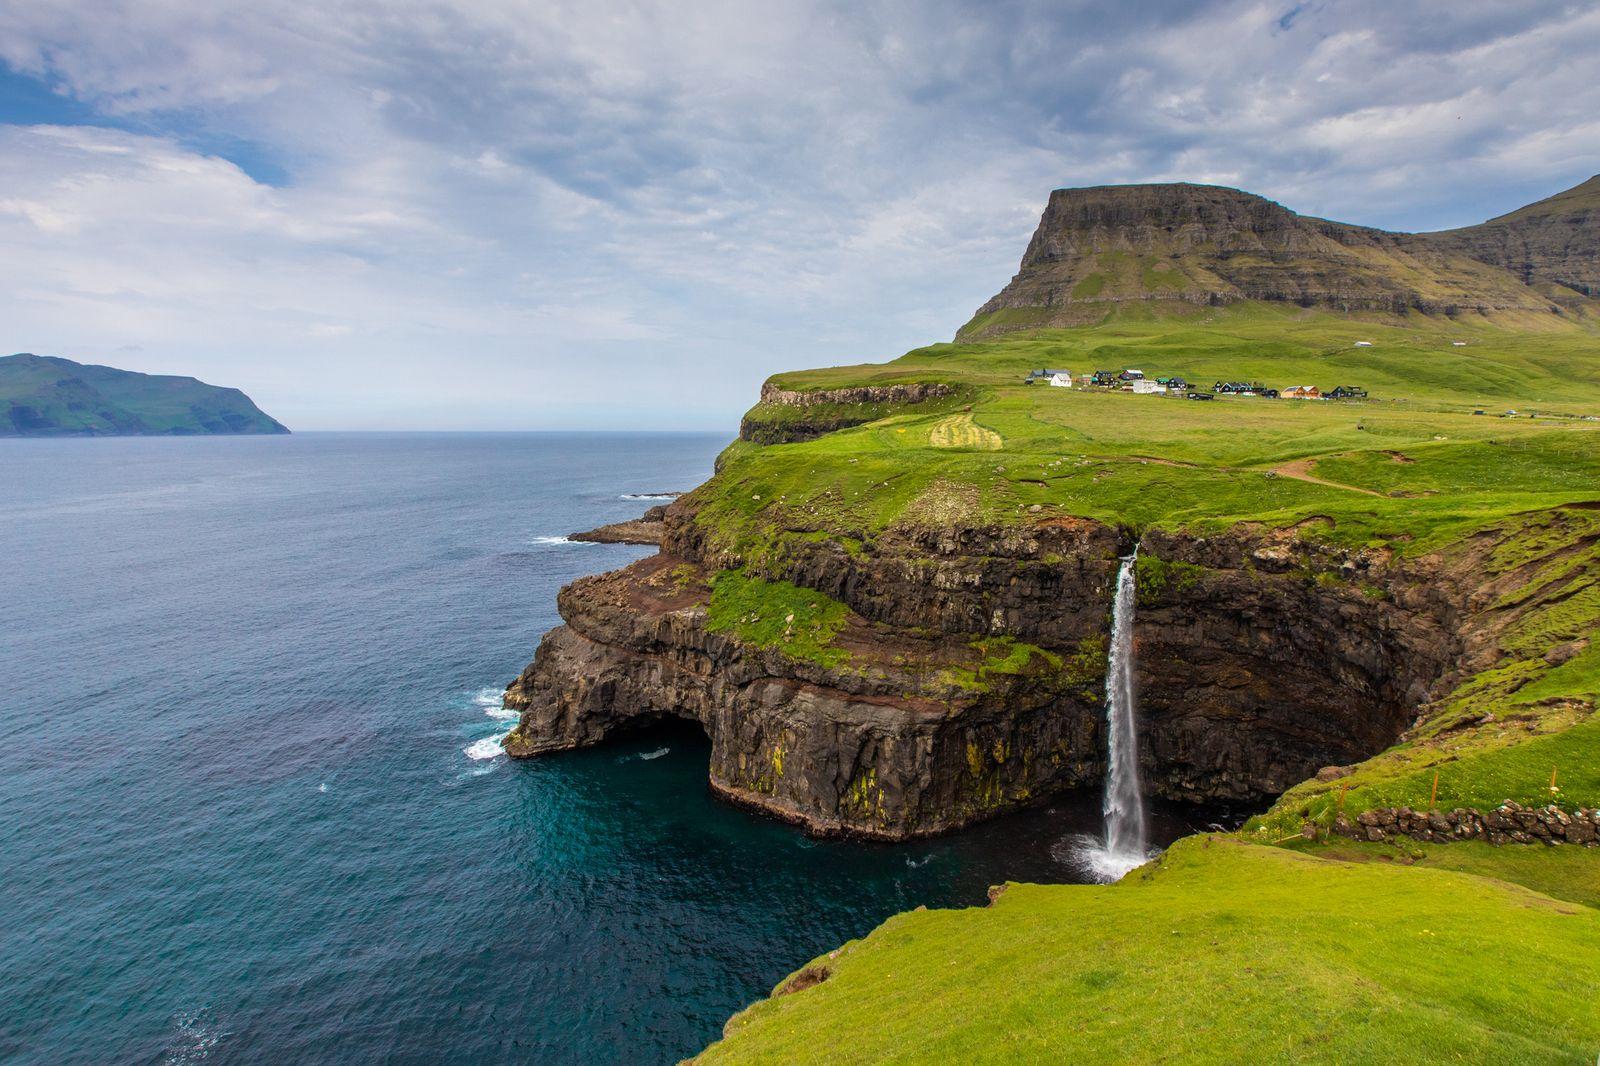 3_Gallery1 - Múlafossur Waterfall - Faroe Islands - Eric Stoen